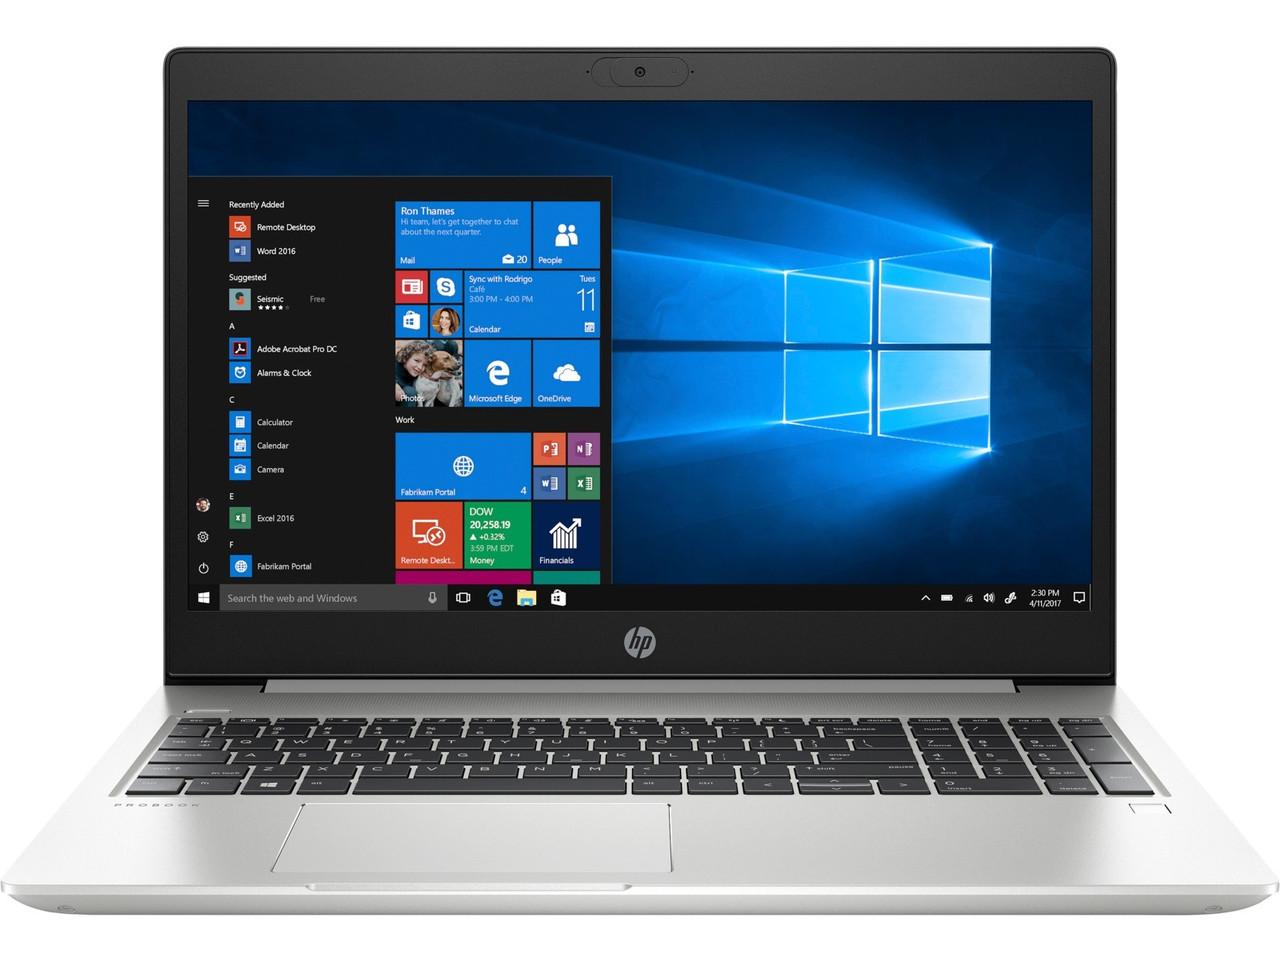 "Ноутбук HP ProBook 450 G7 (6YY21AV_V7); 15.6"" FullHD (1920х1080) IPS LED глянцевый антибликовый / Intel Core i5-10210U (1.6 - 4.2 ГГц) / RAM 8 ГБ /"